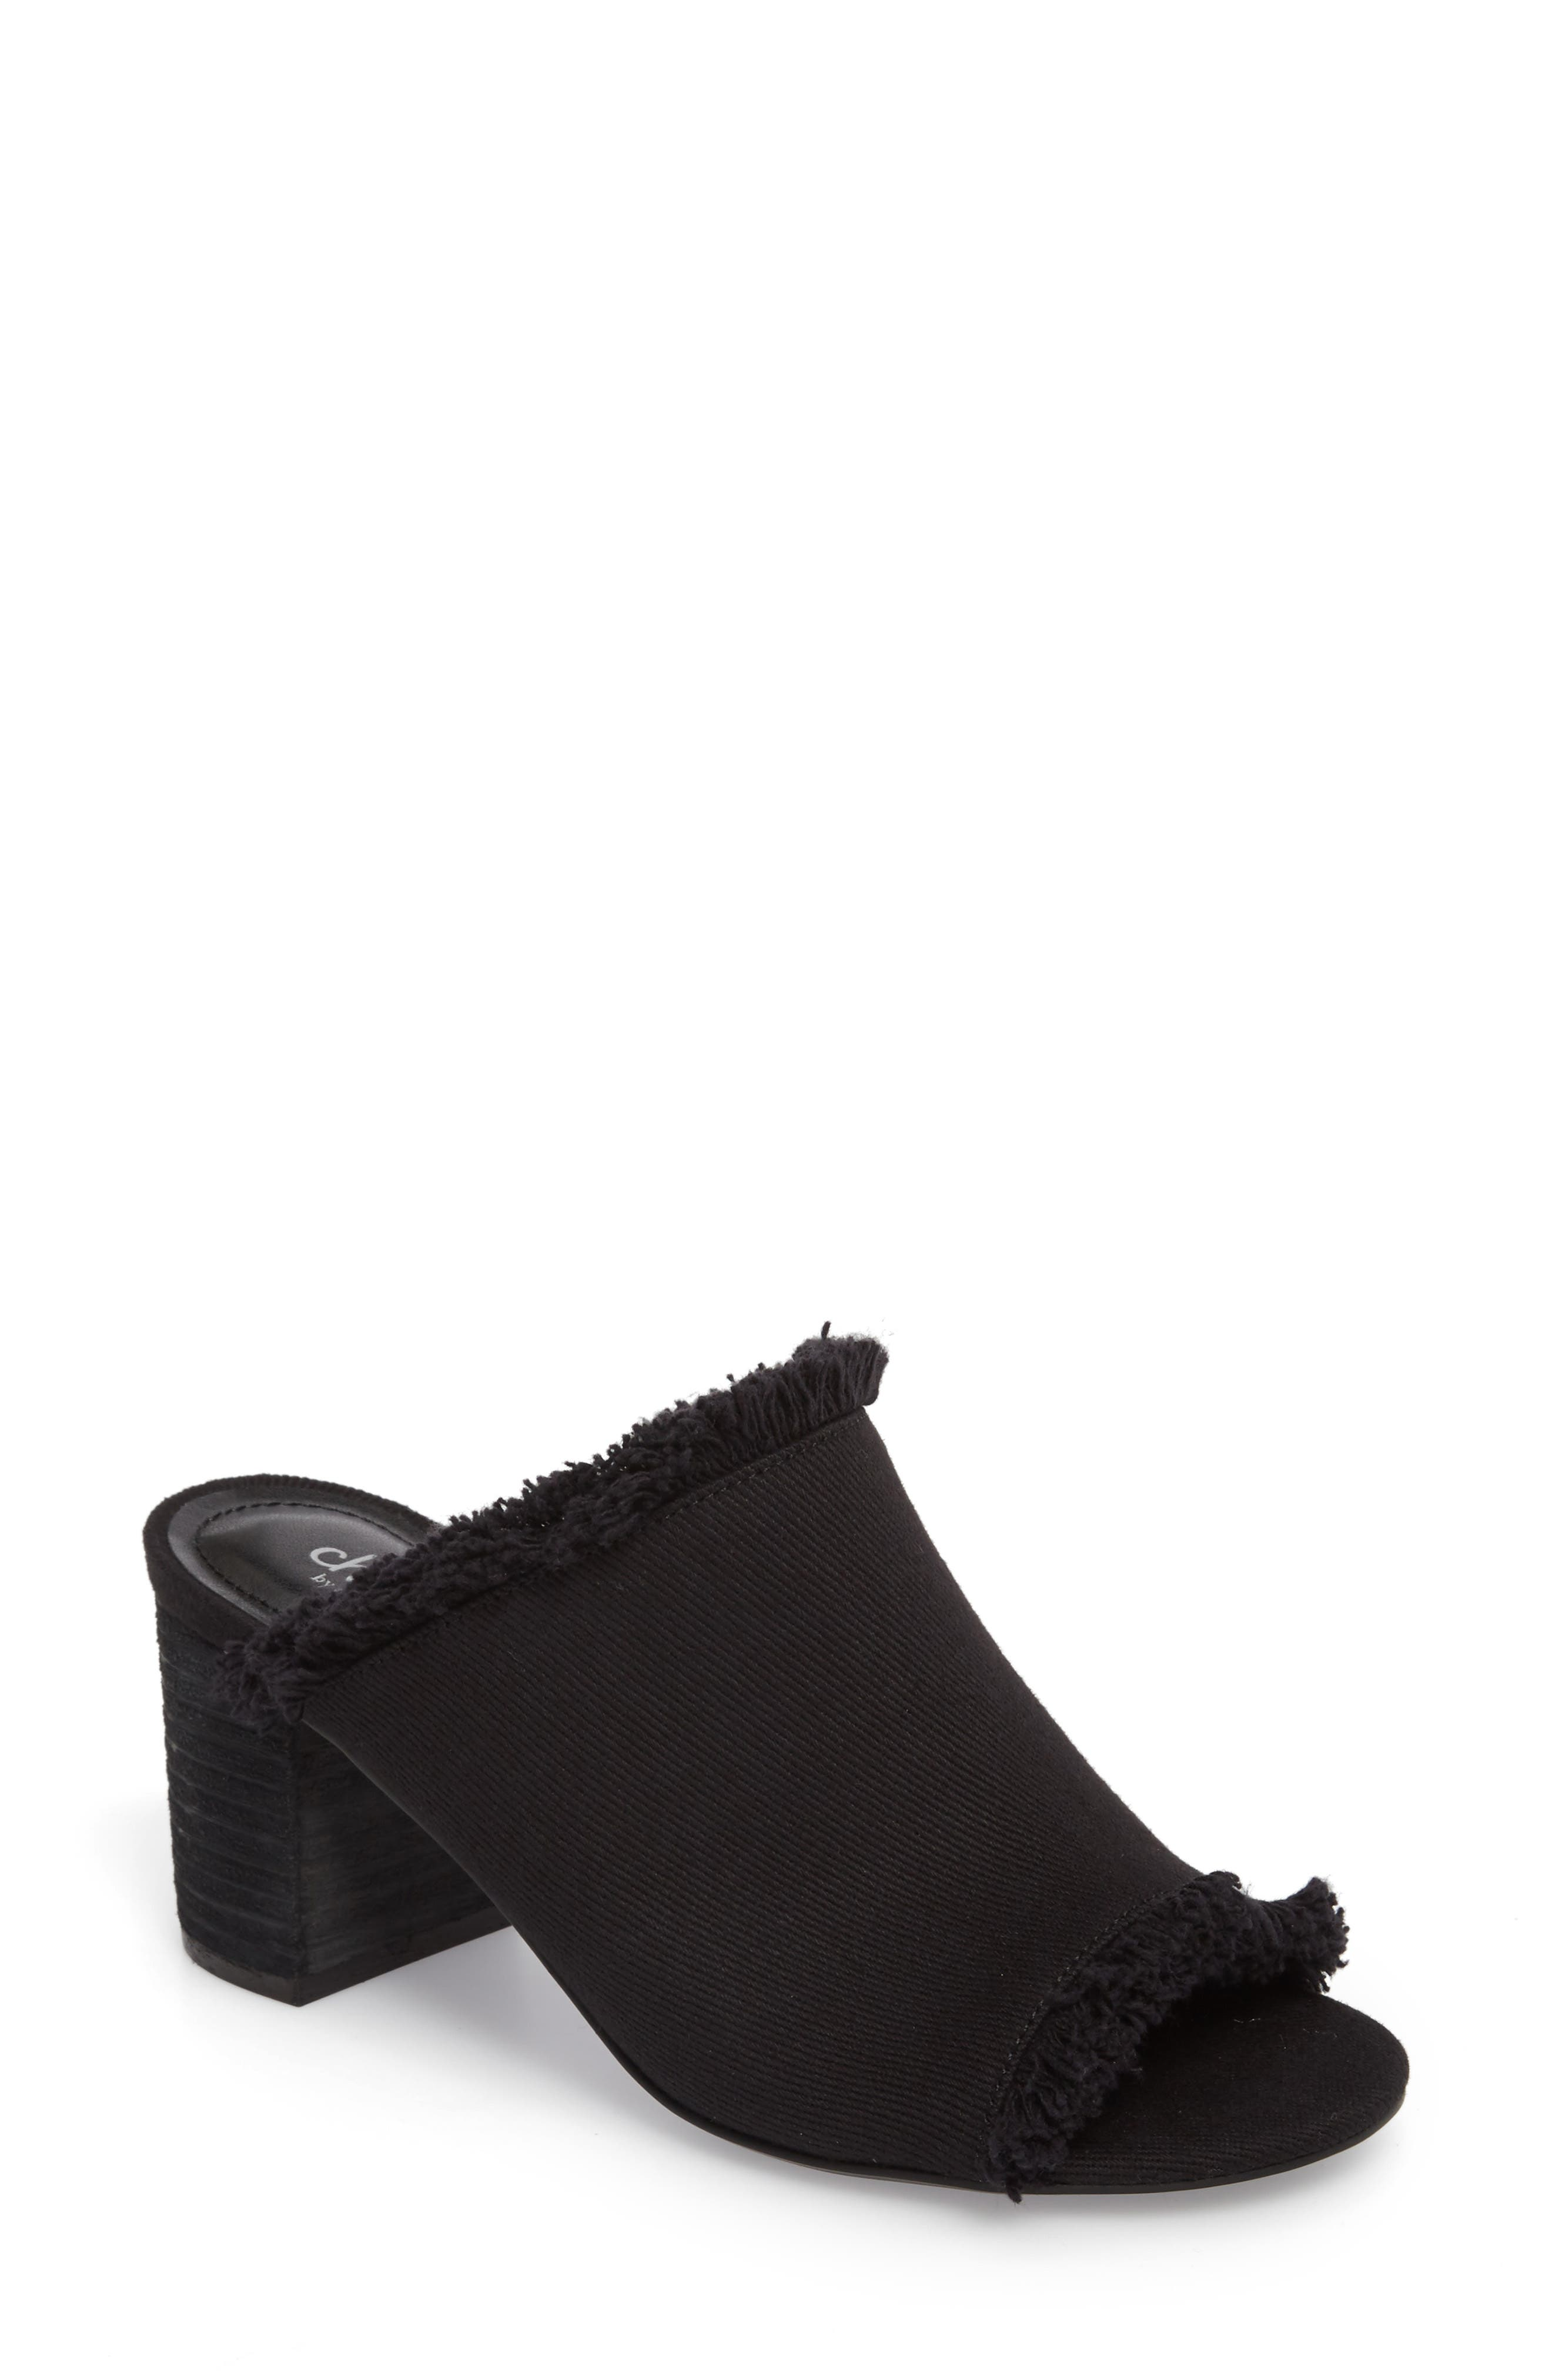 Kadia Fringed Mule Sandal,                         Main,                         color, 001